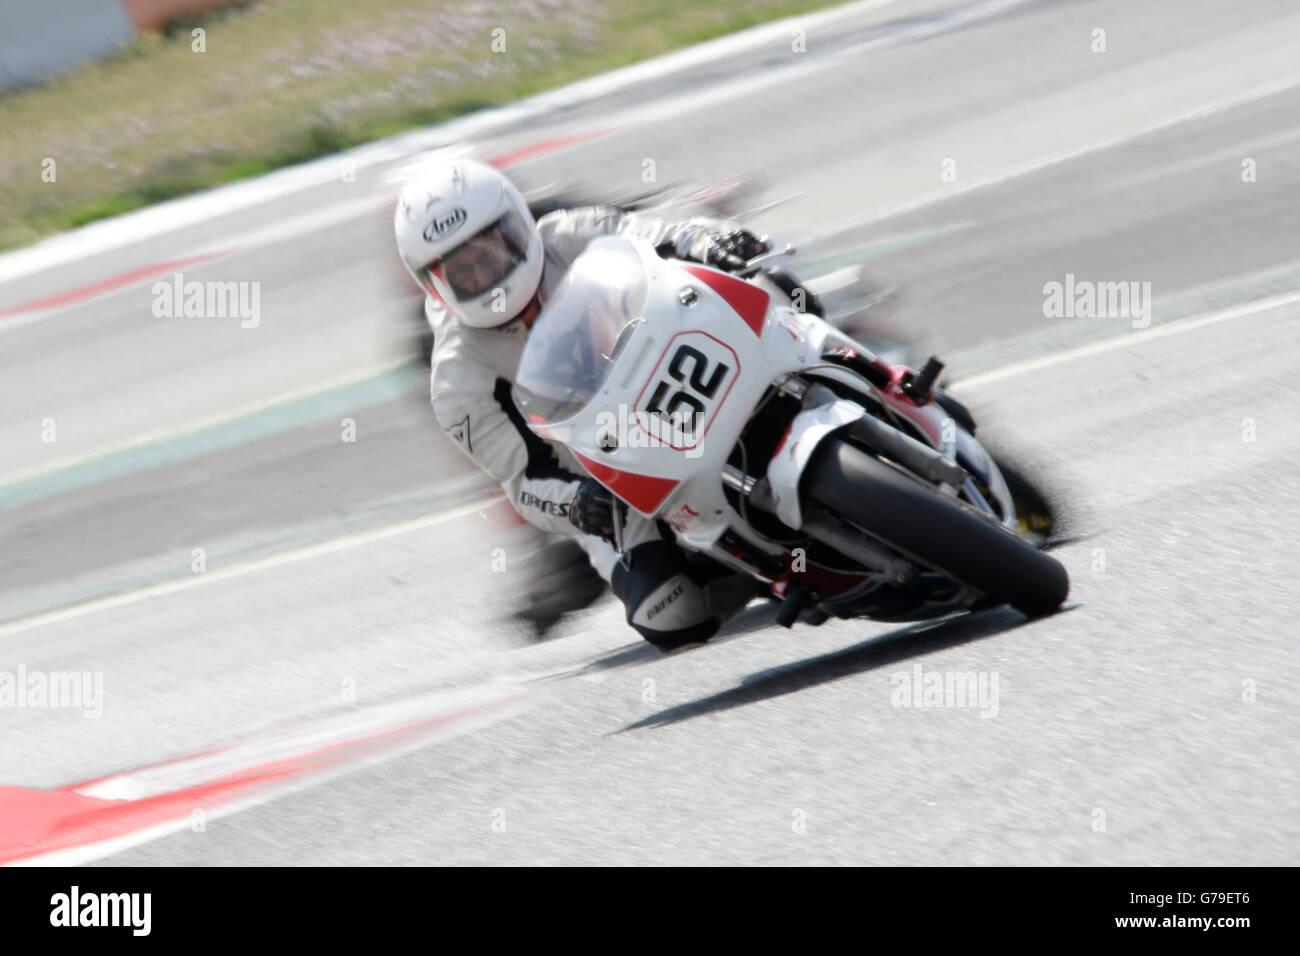 Barcelona, Spain. 26th June, 2016. CABANES CATALA, JORGE SANTIAGO member of the Moto Club Escudería Pistón - Stock Image